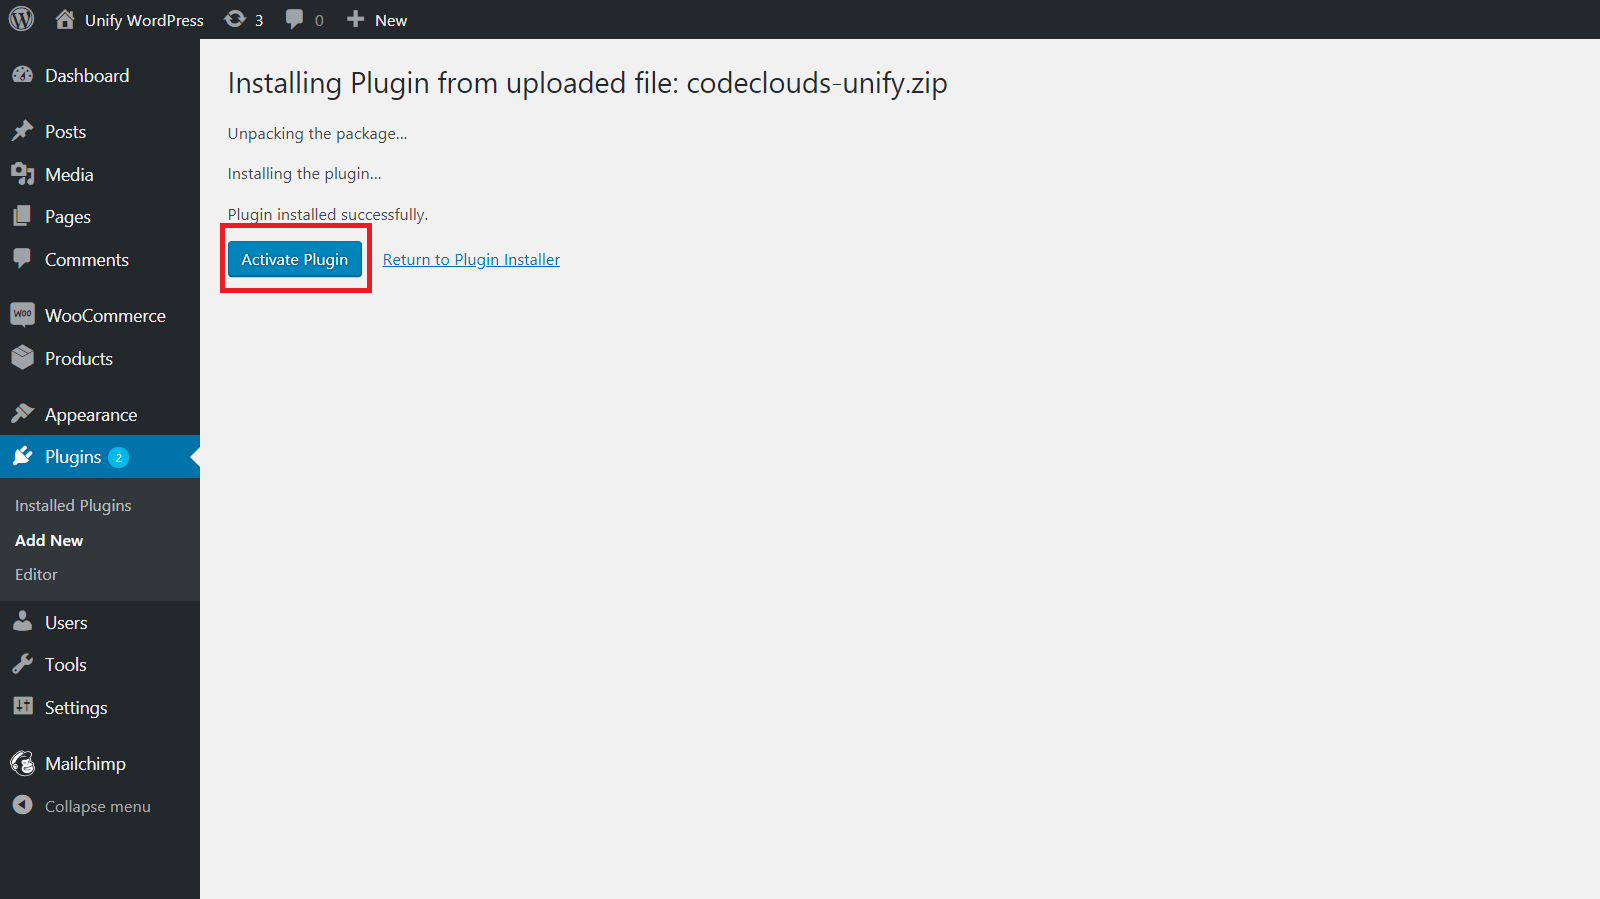 Unify wordpress plugin activation step